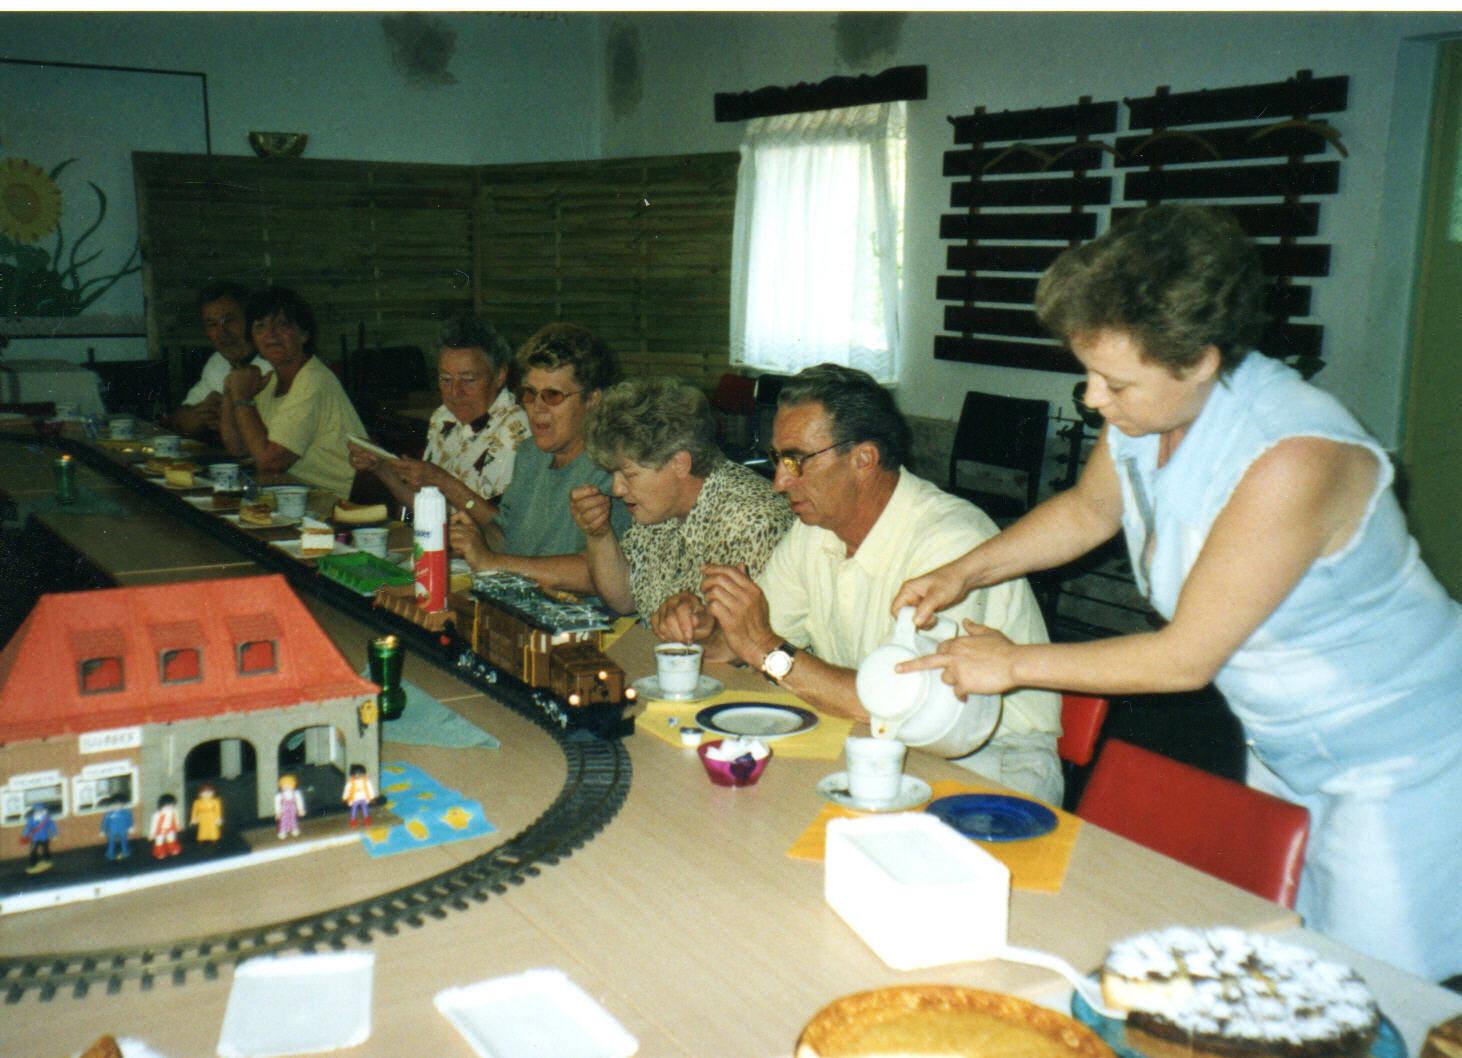 Rentnertreff 2003